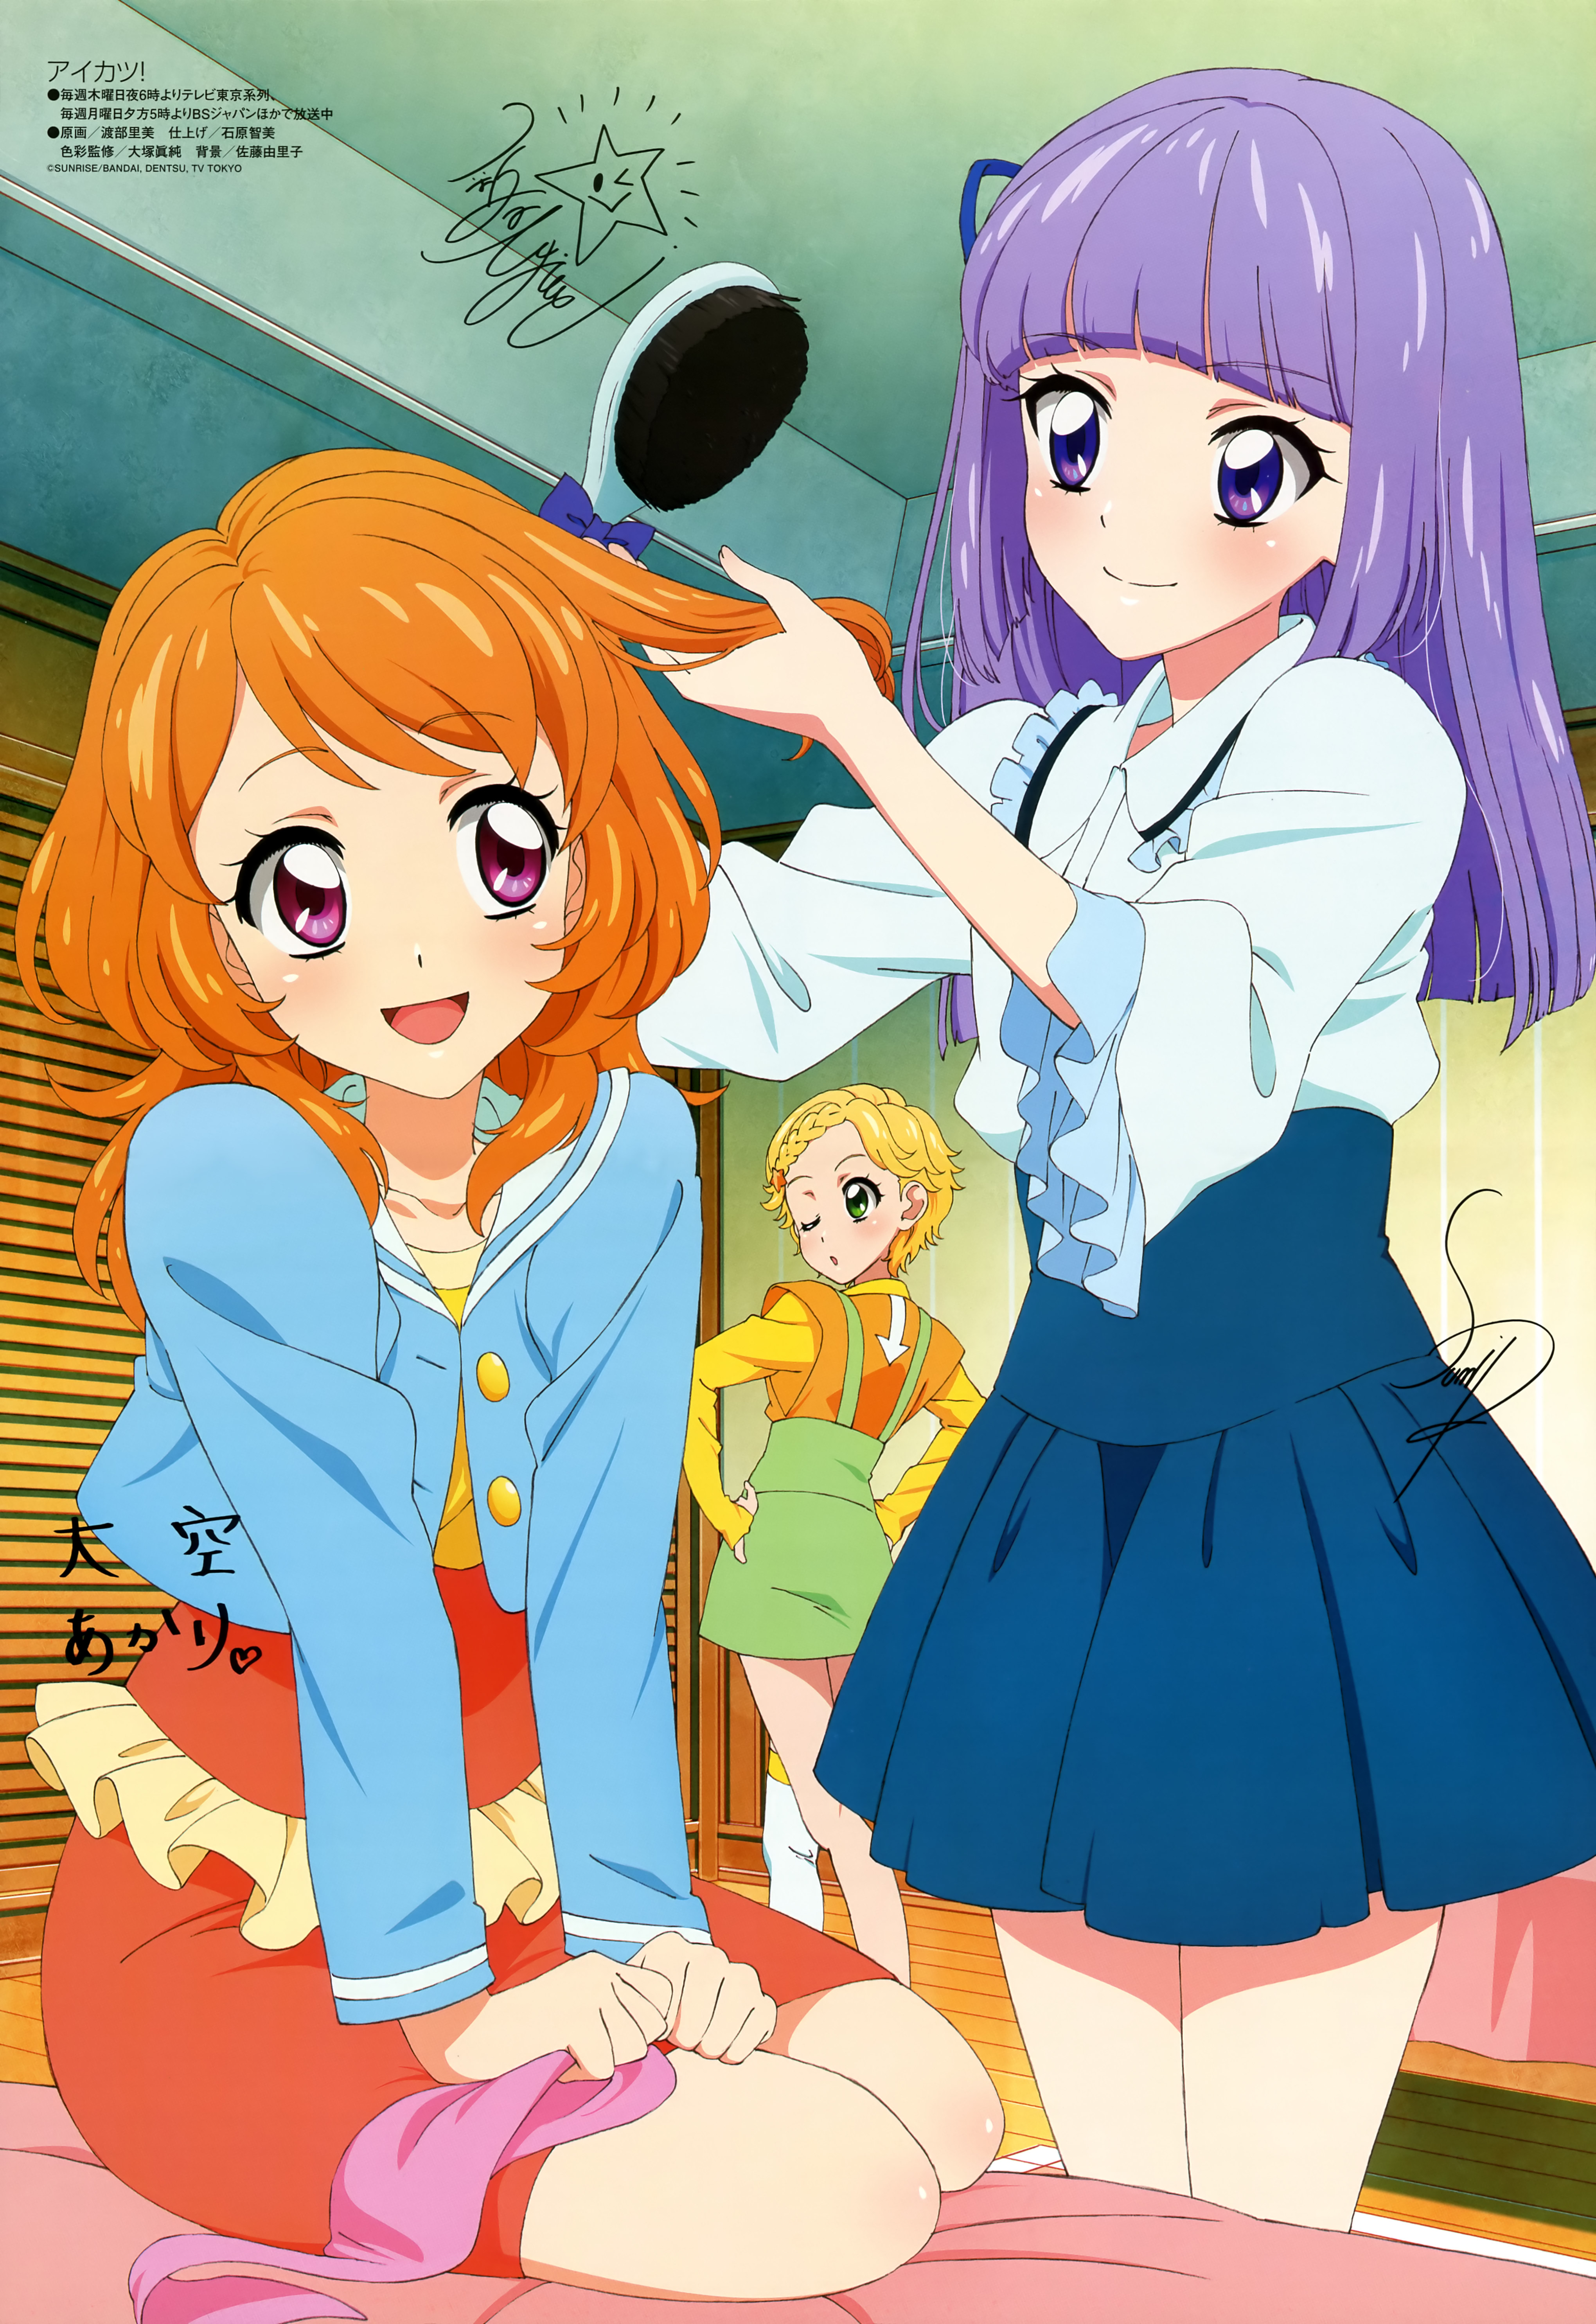 Haruhichan.com Animedia November 2014 posters aikatsu! autographed dress hikami_sumire oozora_akari shinjou_hinaki watanabe_satomi